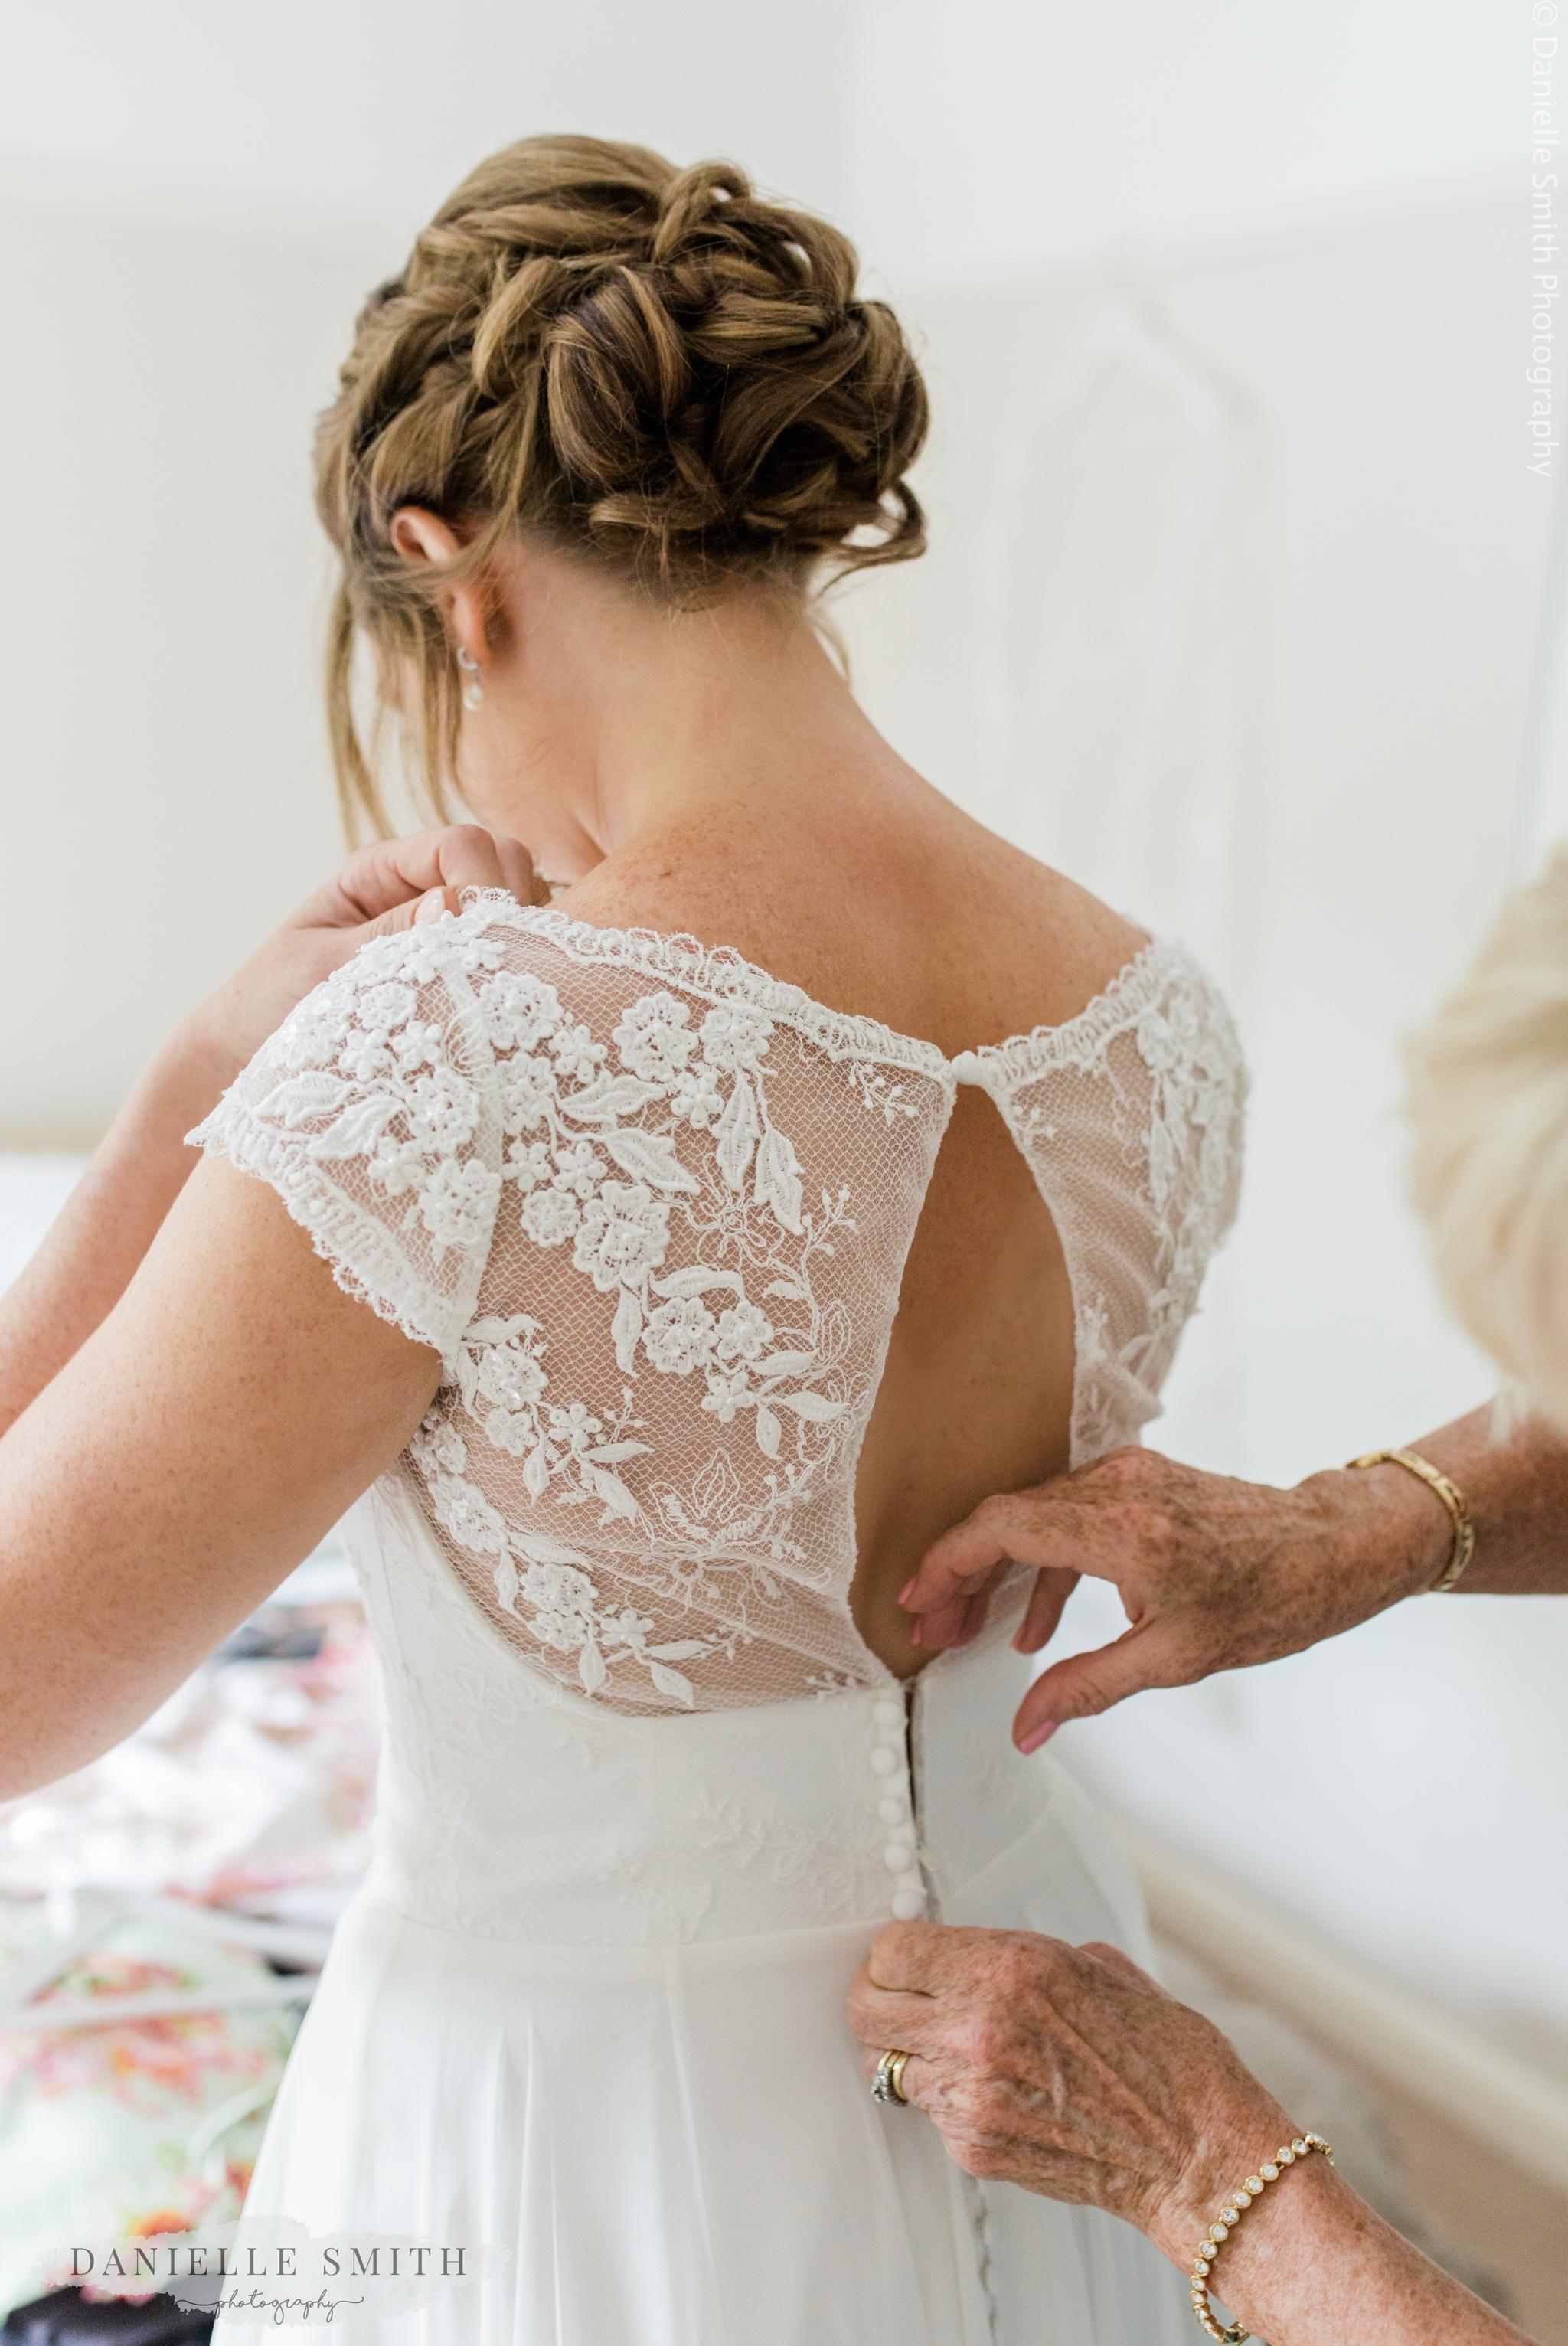 mum doing up back of brides dress